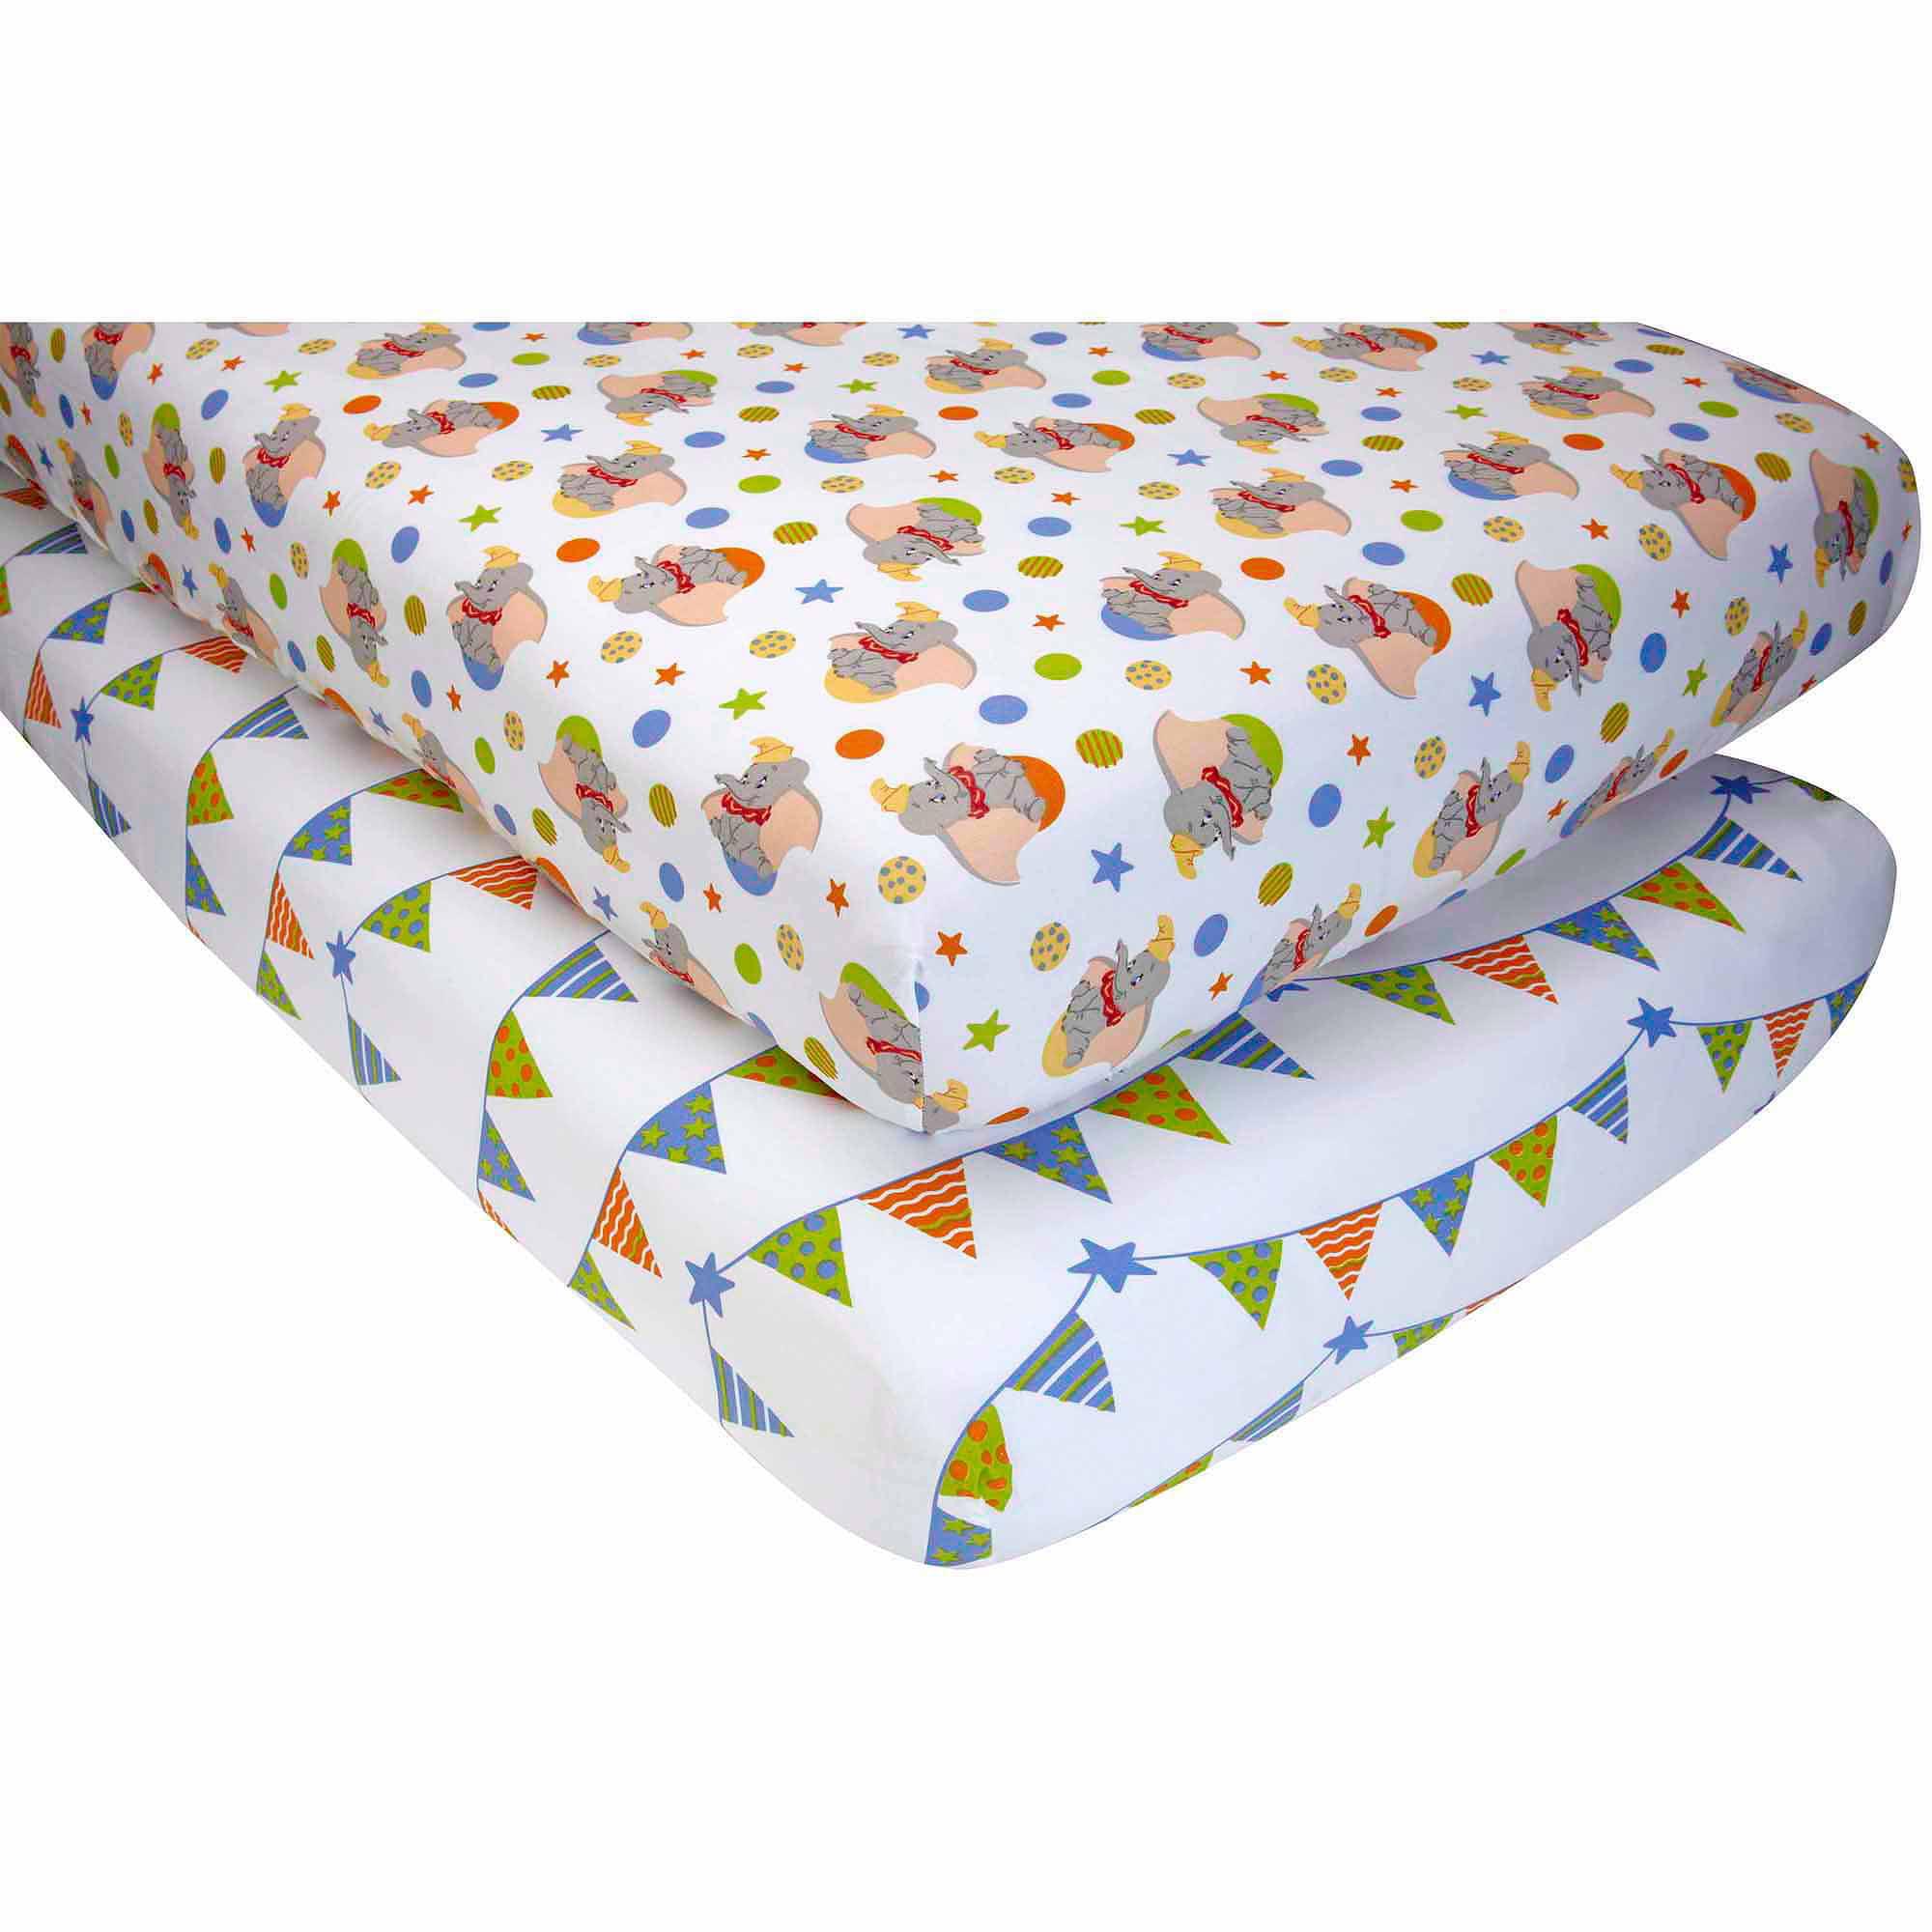 Disney Baby Bedding Crib Sheets Dumbo 2 Pack Walmart Com Walmart Com